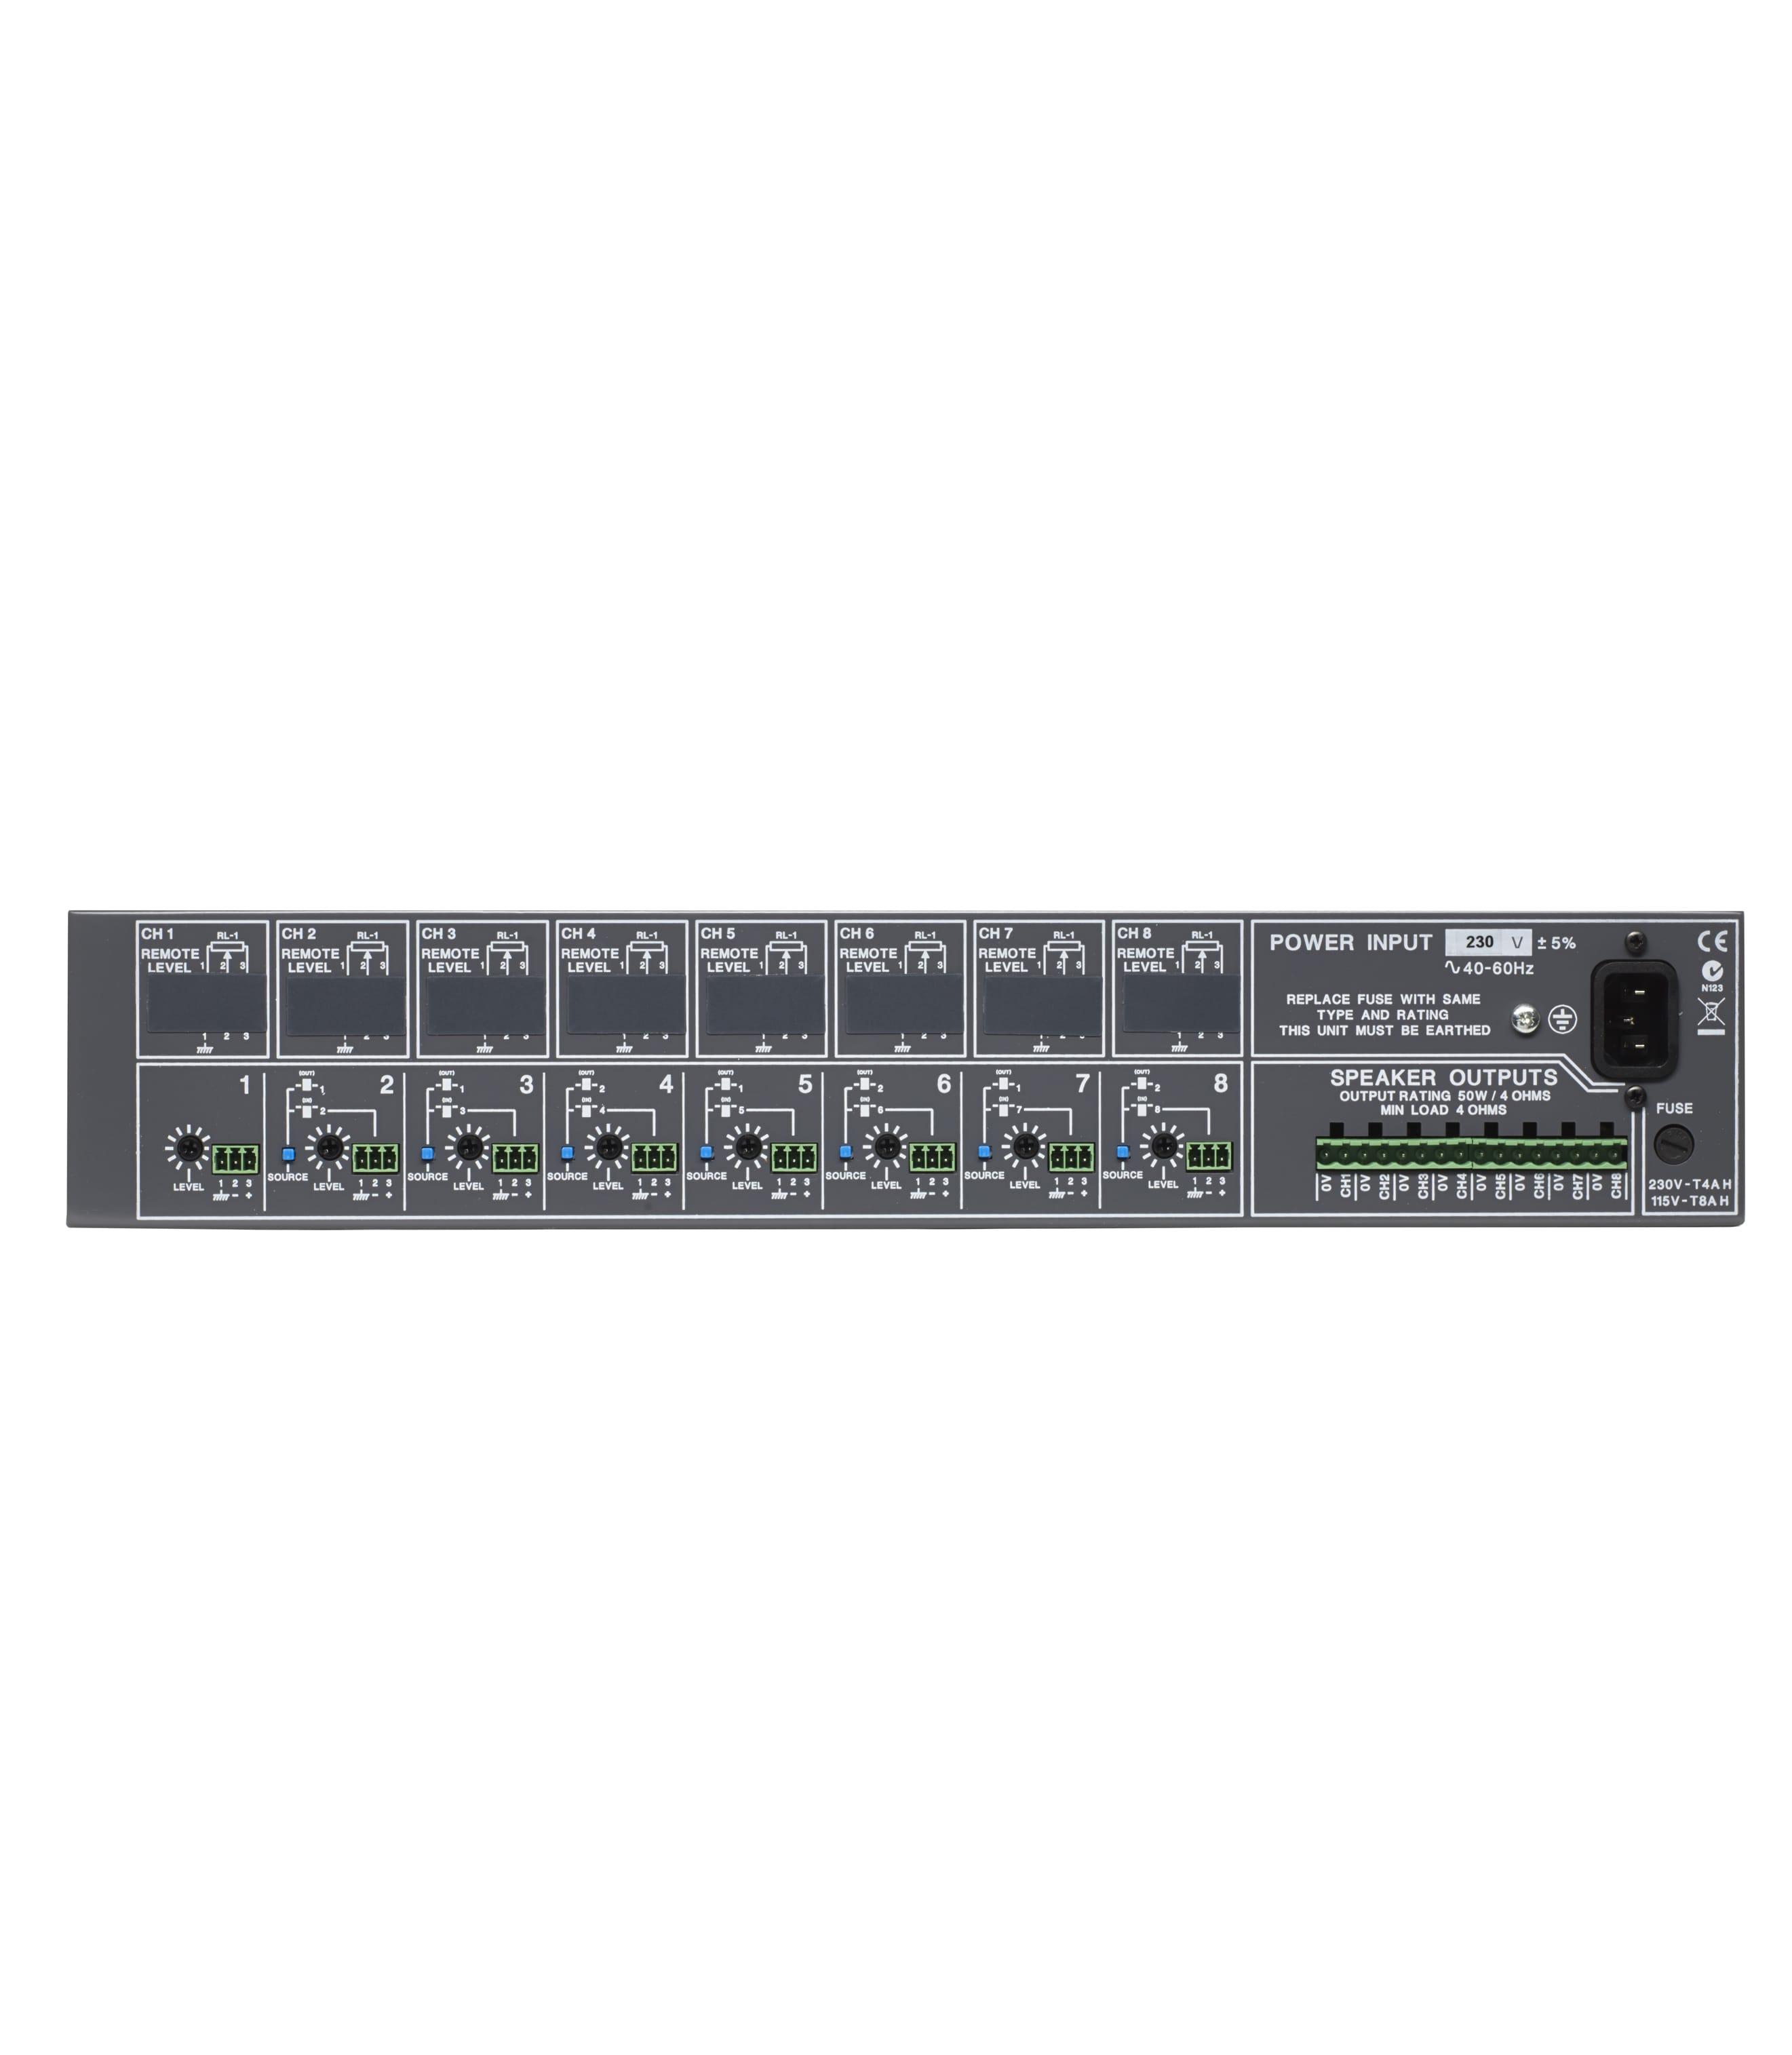 CX A850 - Buy Online